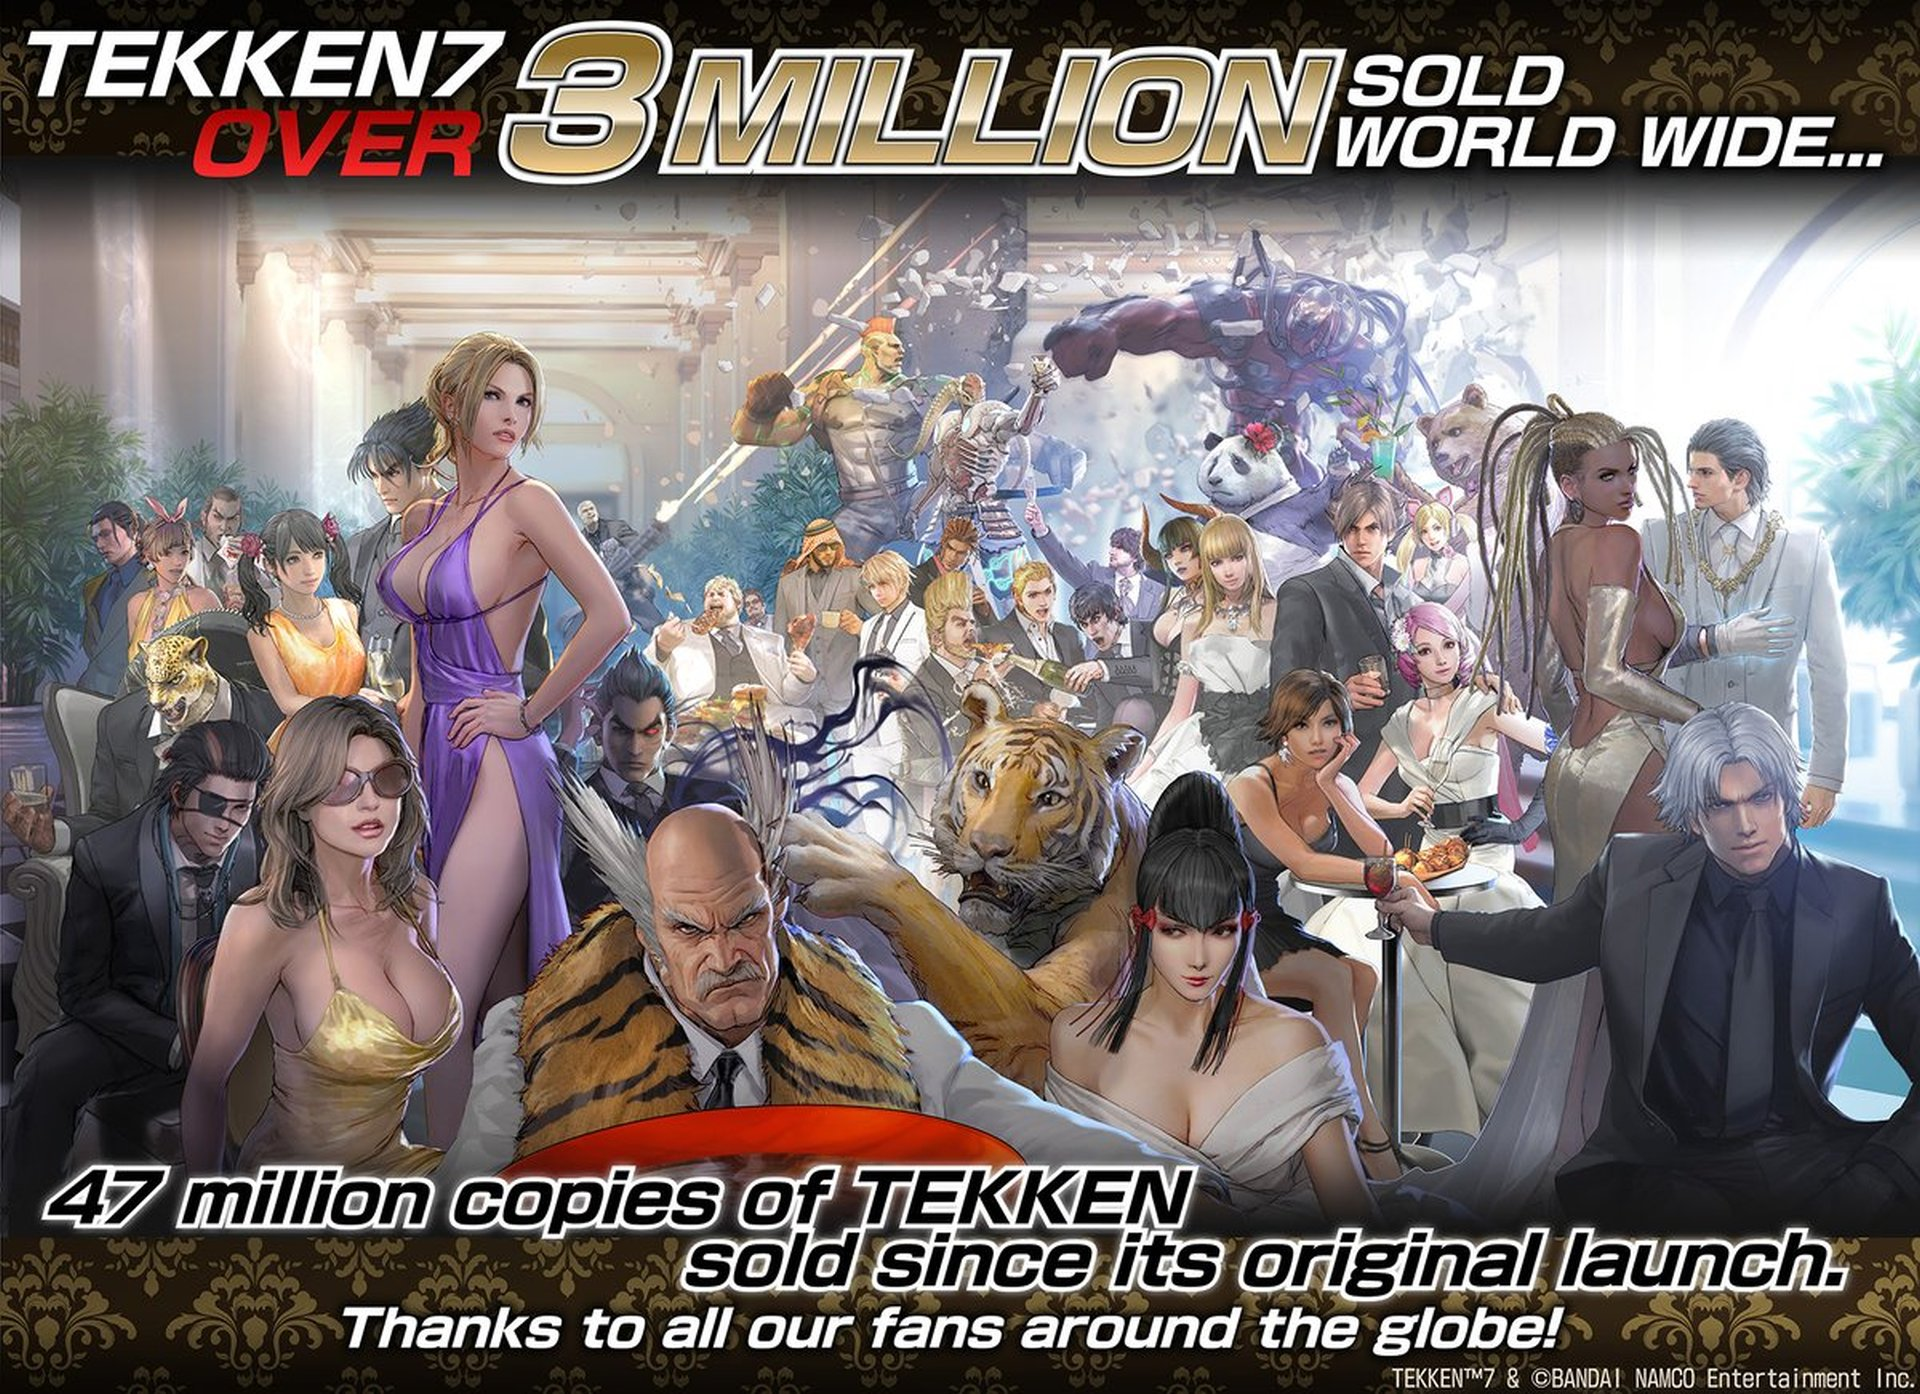 Tekken 7 Sold Over 3 Million Units Worldwide, Harada Reveals